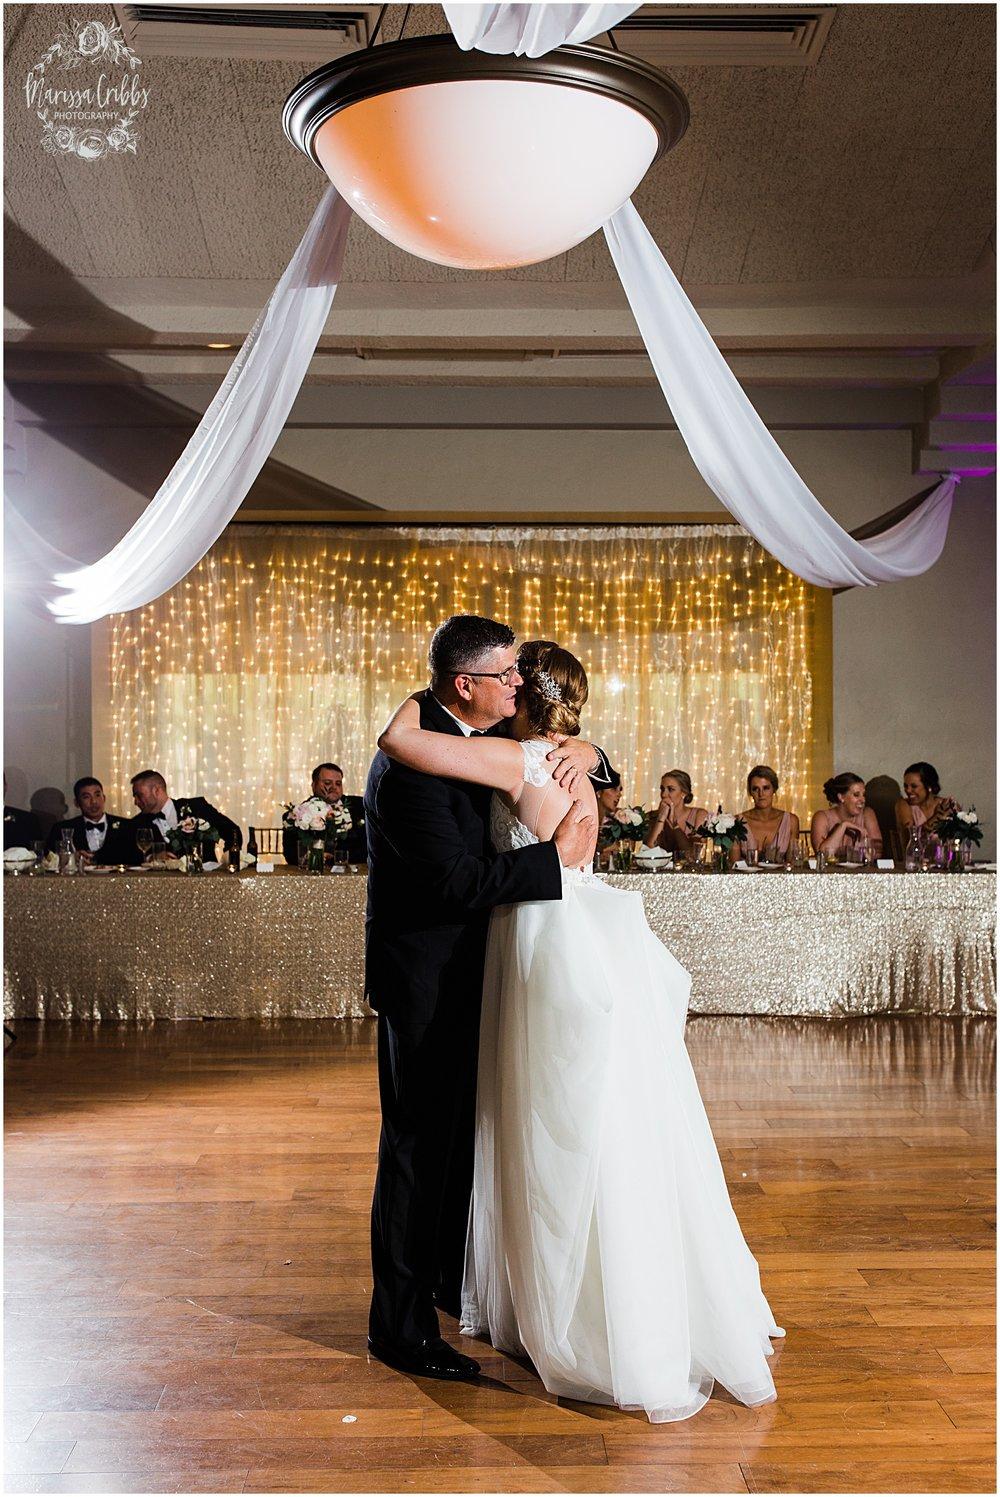 LAKE QUIVIRA COUNTRY CLUB WEDDING | MORGAN & RYAN | MARISSA CRIBBS PHOTOGRAPHY_5525.jpg